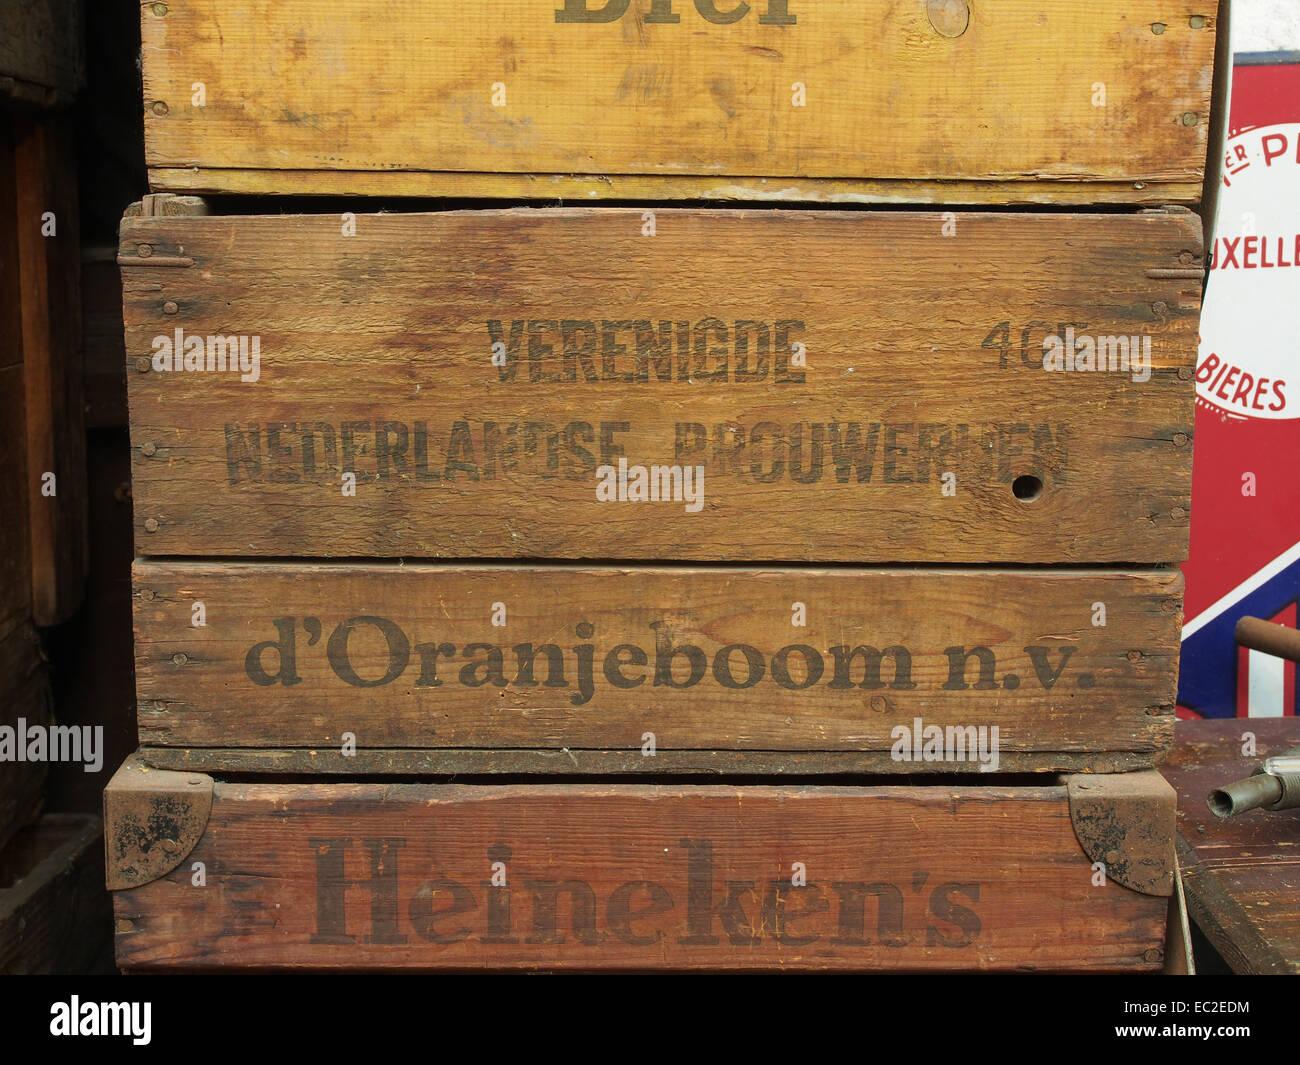 Verenigde Nederlandse Brouwerijen dOranjeboom NV bierkrat - Stock Image